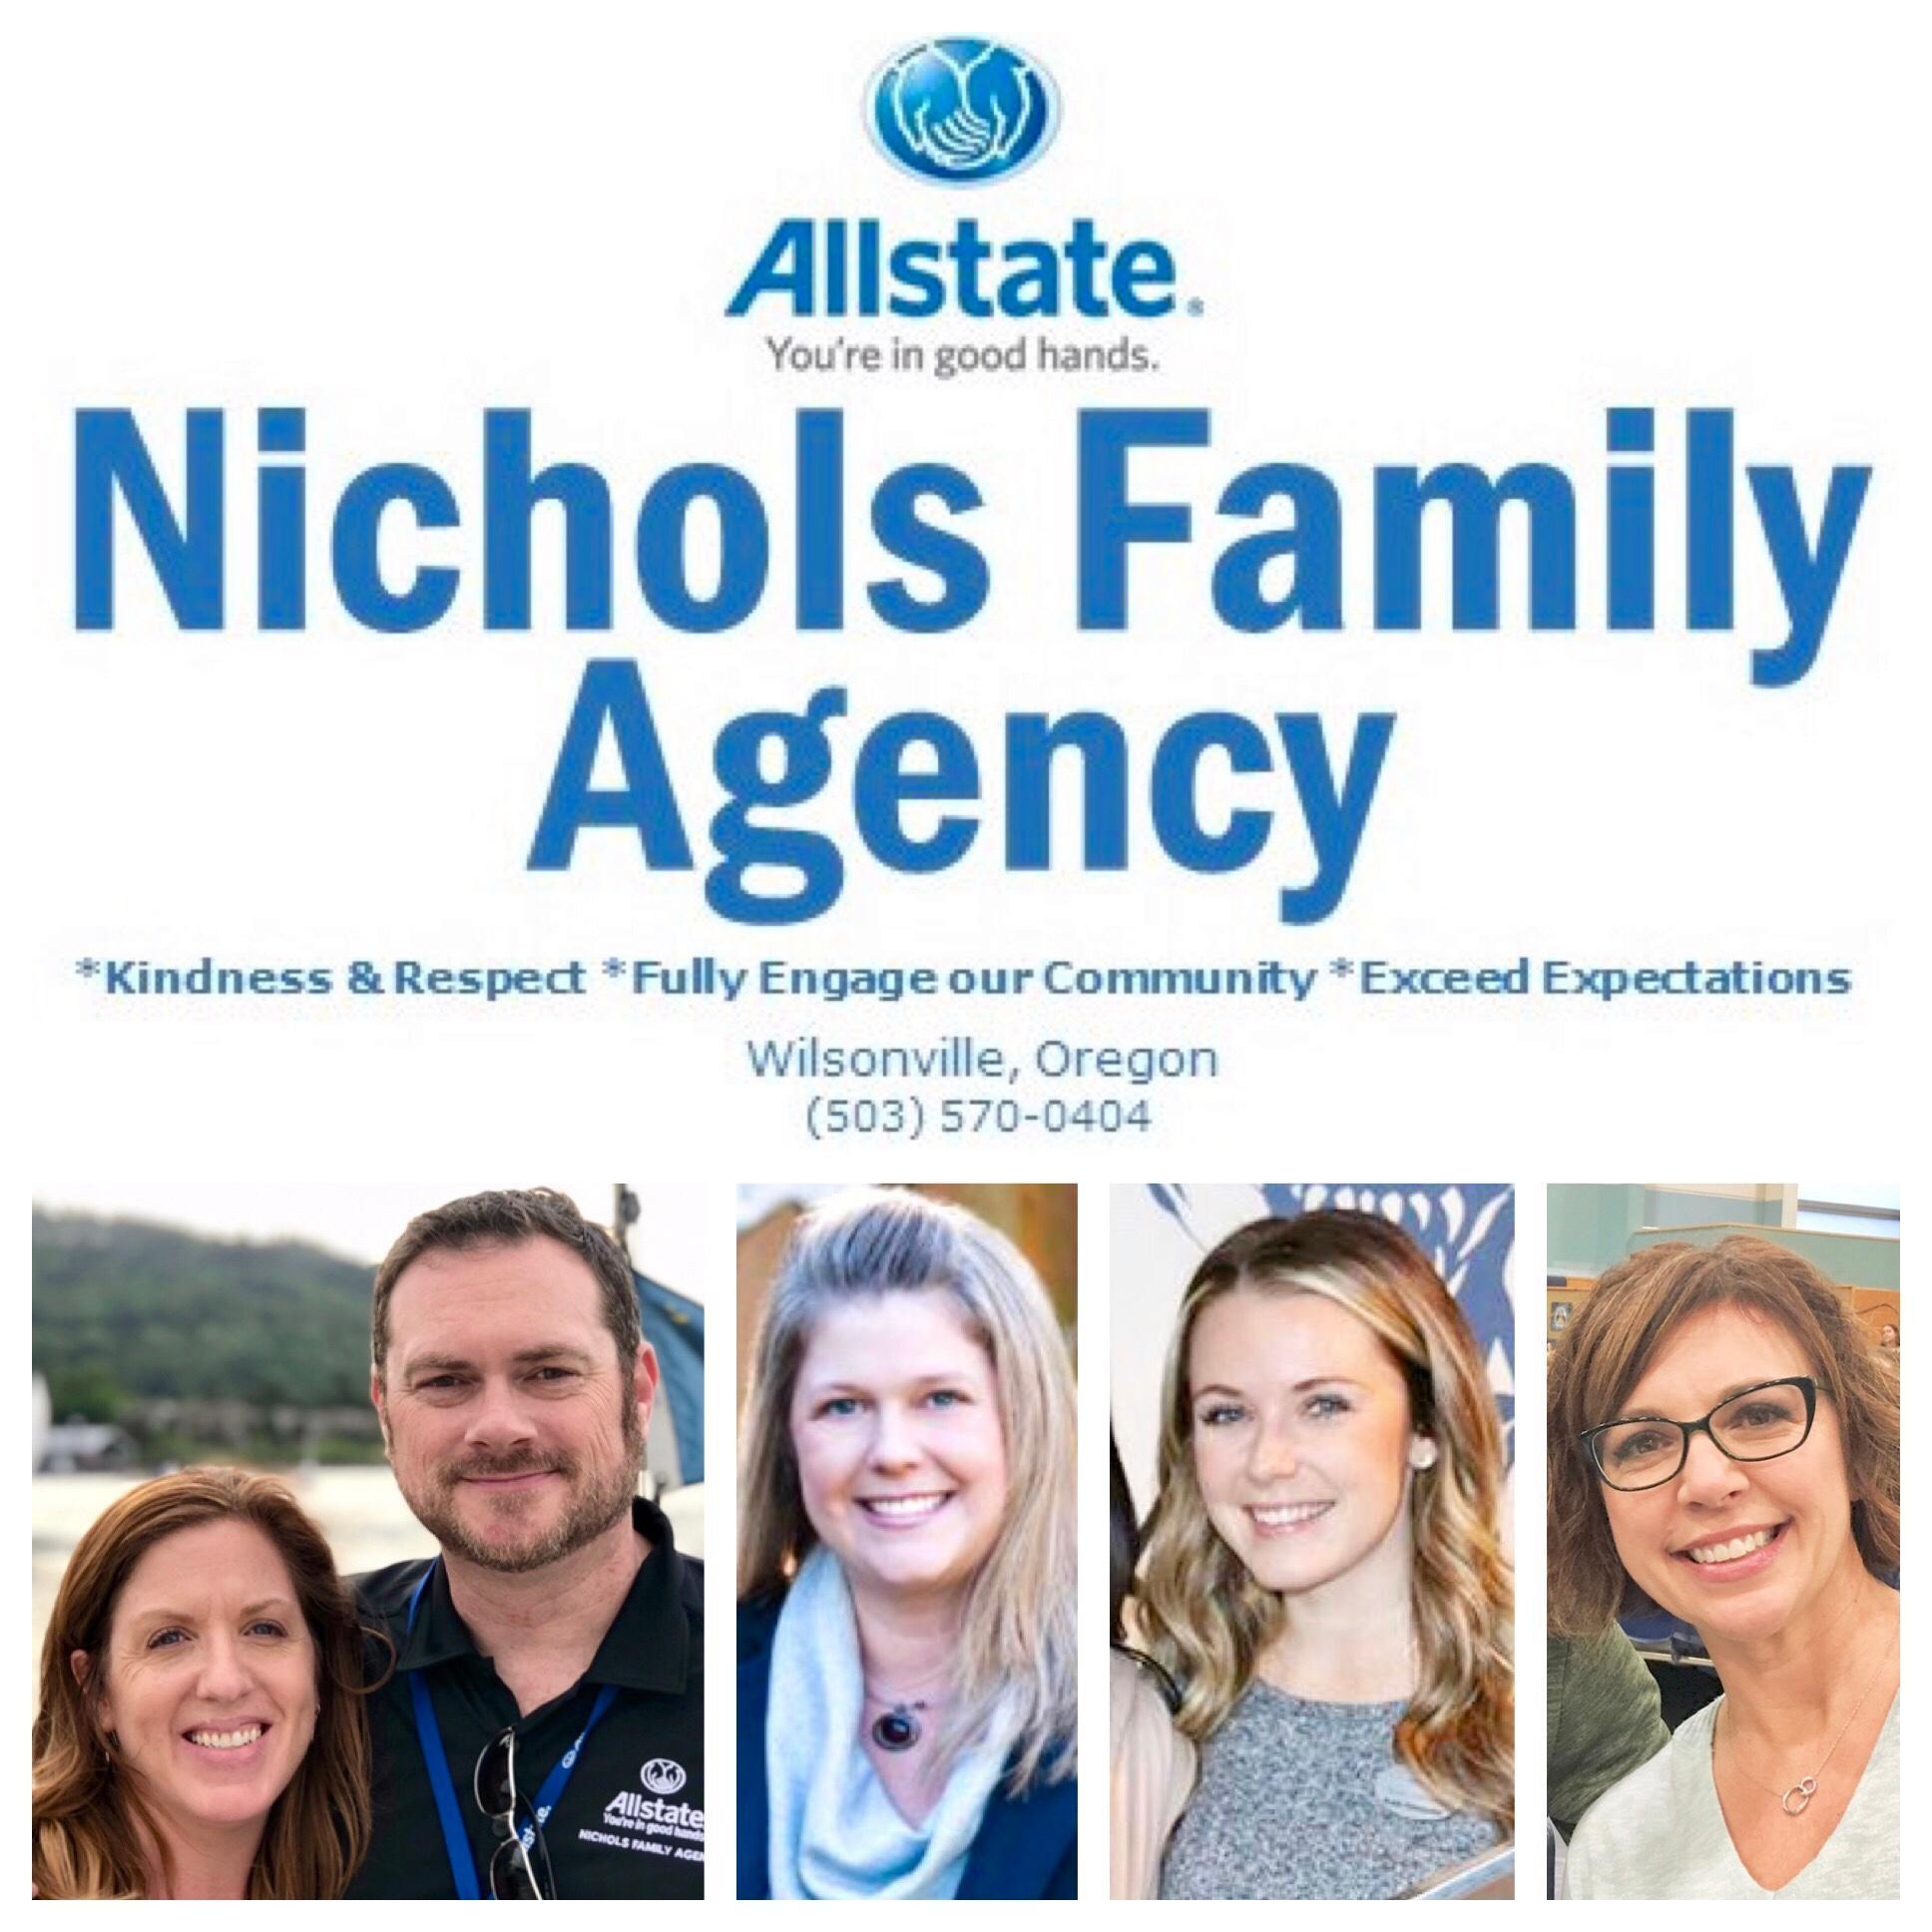 Nichols Family Agency: Allstate Insurance image 1